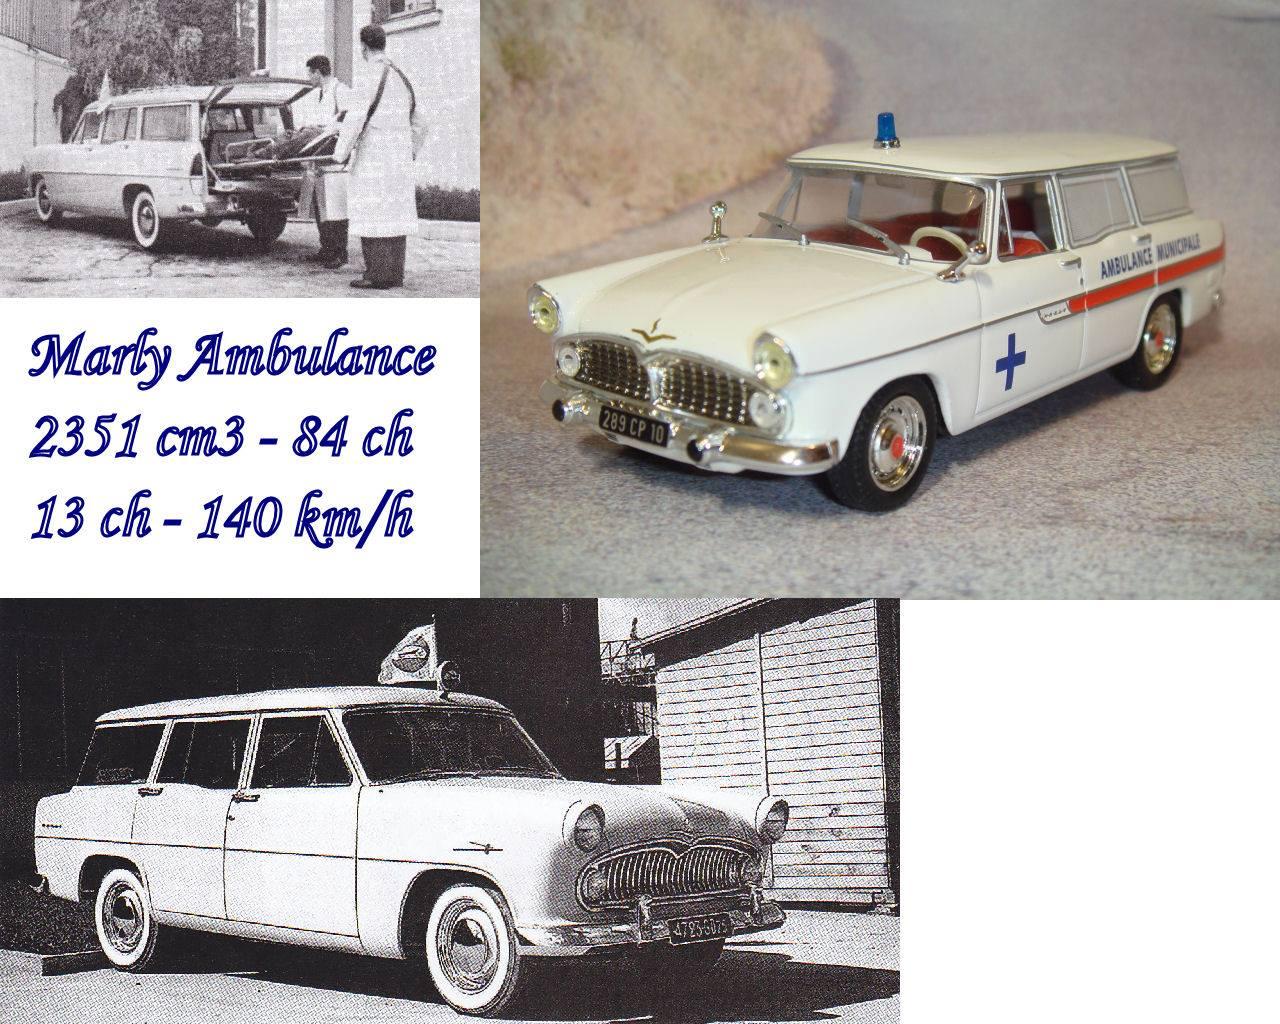 simca-vedette-marly-ambulance-jaar-1956-1959-1